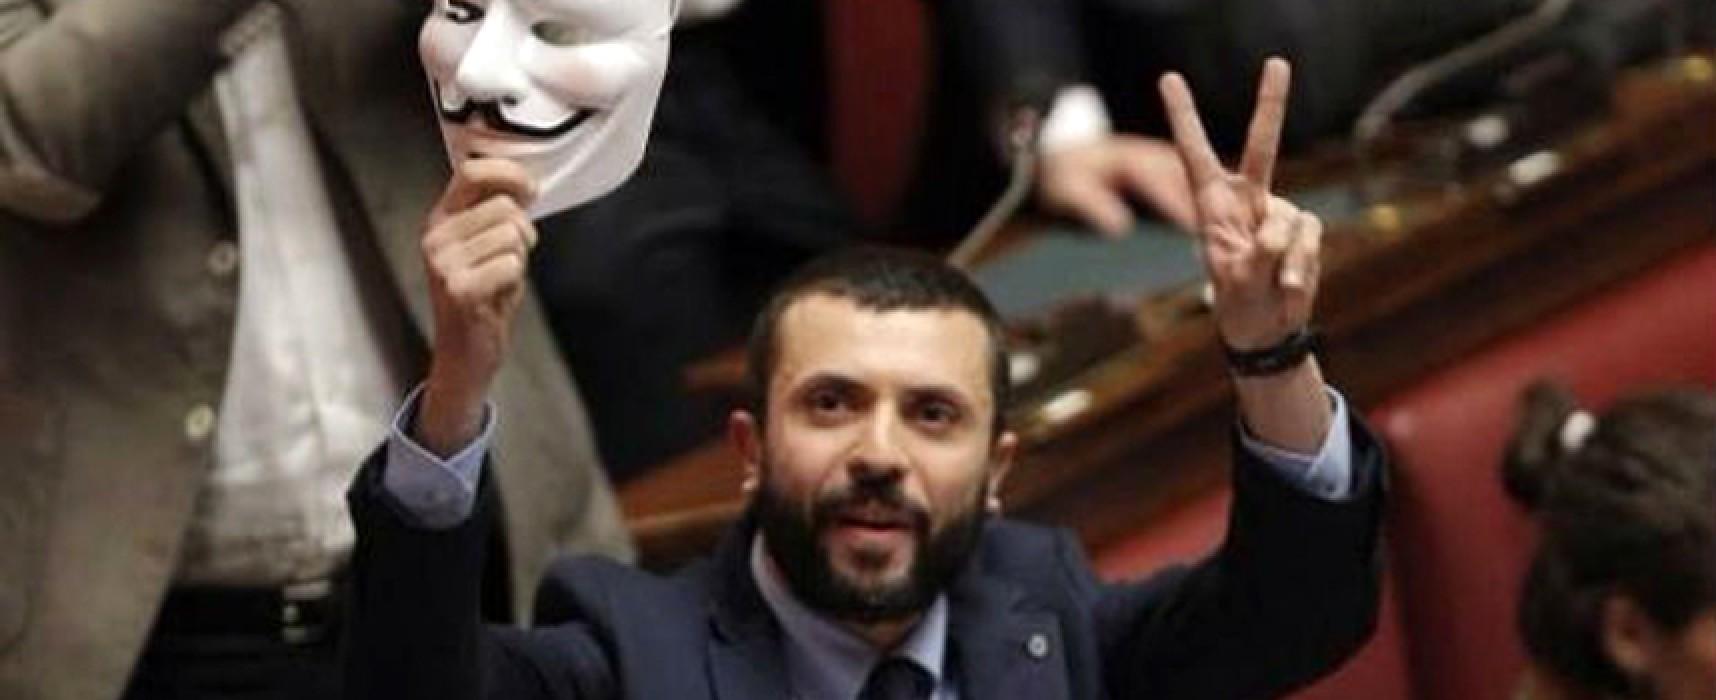 Movimento 5 Stelle, stasera l'On. D'Ambrosio in Piazza Margherita